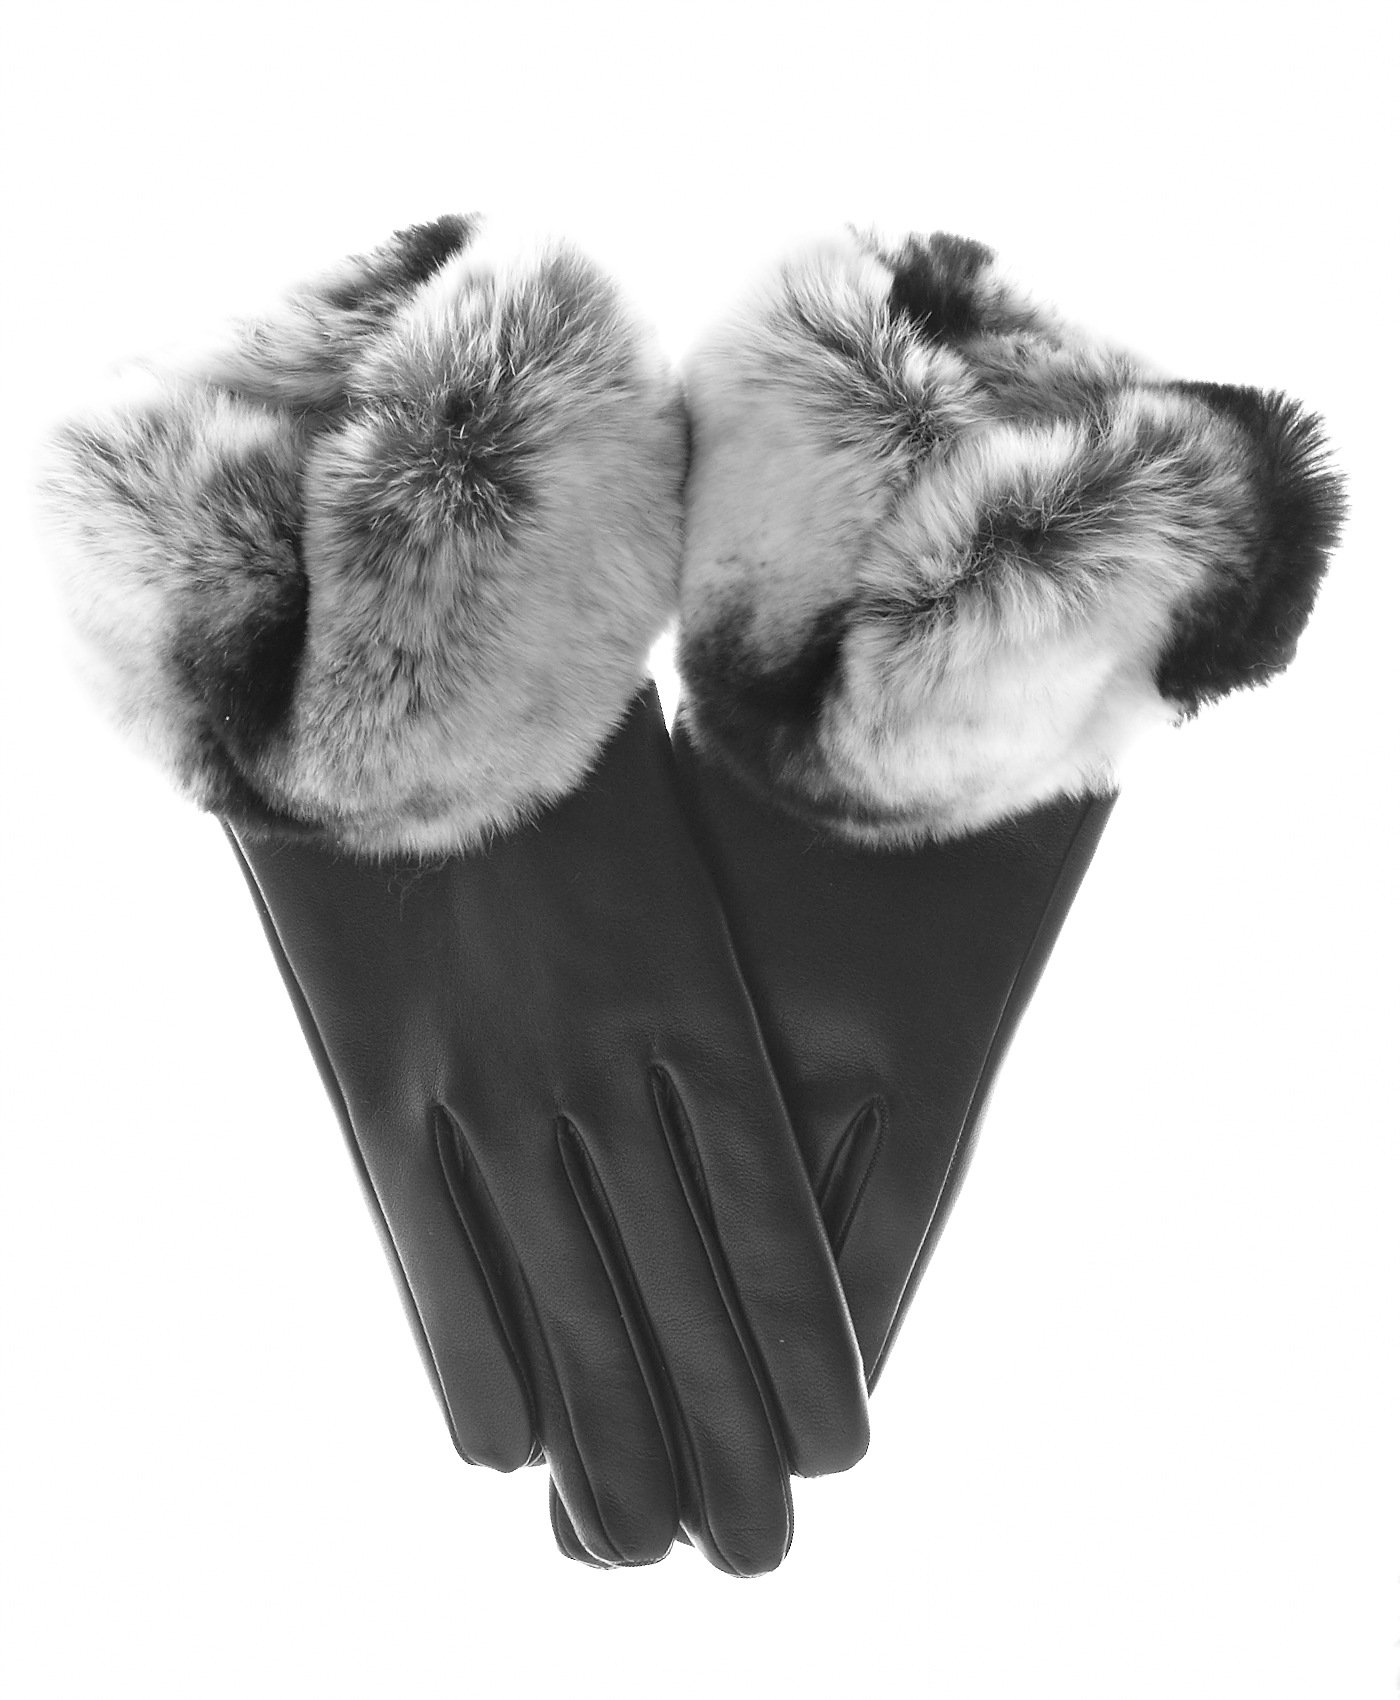 Fratelli Orsini Women's Rex Rabbit Fur Cuff Cashmere Lined Winter Leather Gloves Size 8 1/2 Color Black